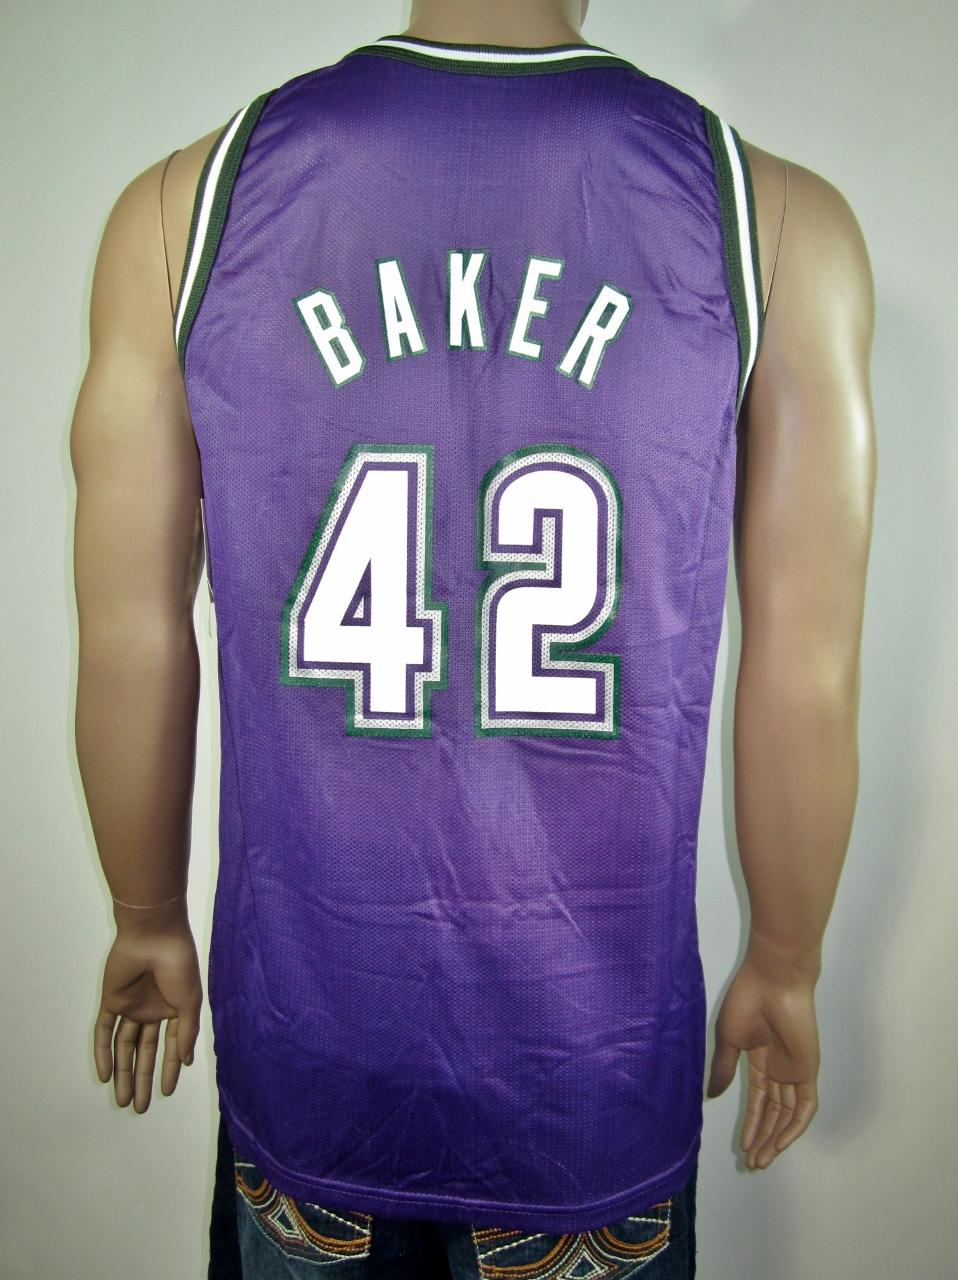 Vin Baker Milwaukee Bucks Champion Jersey 44 NWT · DFRNSH8 · Online ... 2b079881b